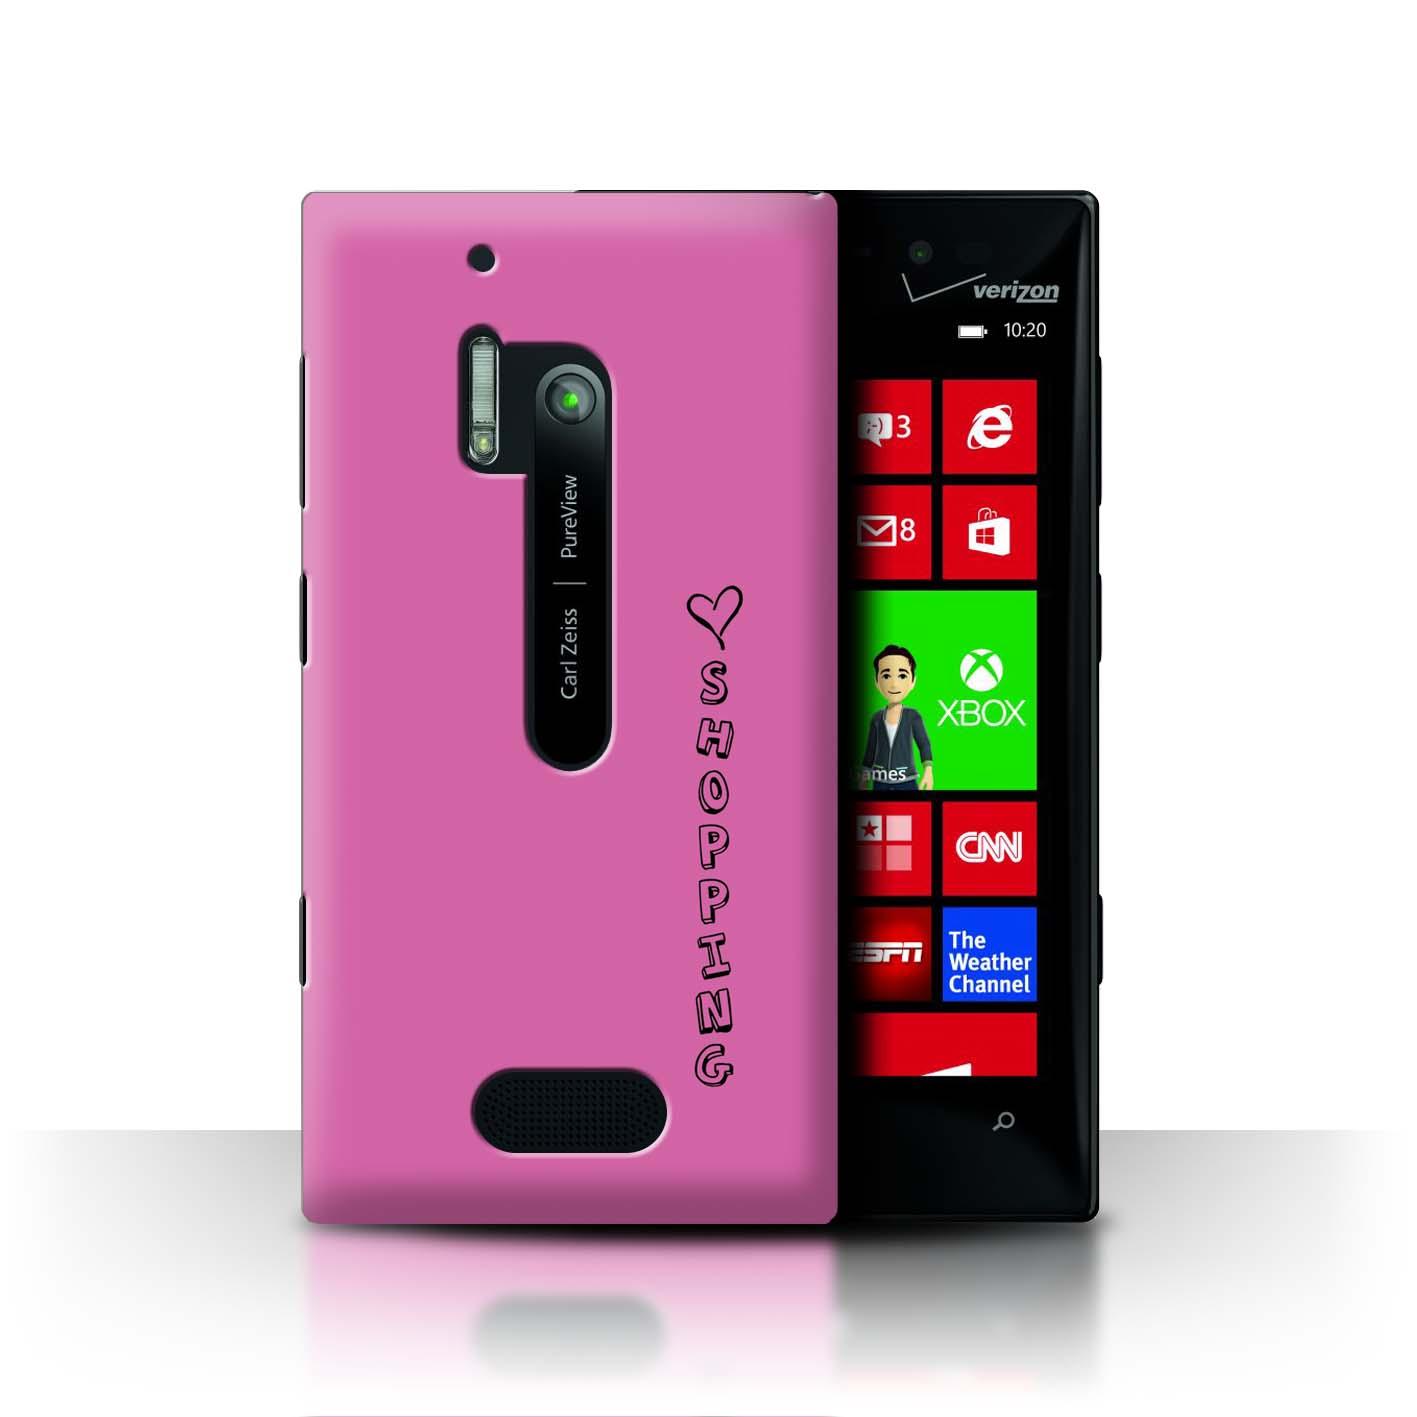 Stuff 4 teléfono caso/cubierta trasera para Nokia Lumia 928/Corazón Xoxo